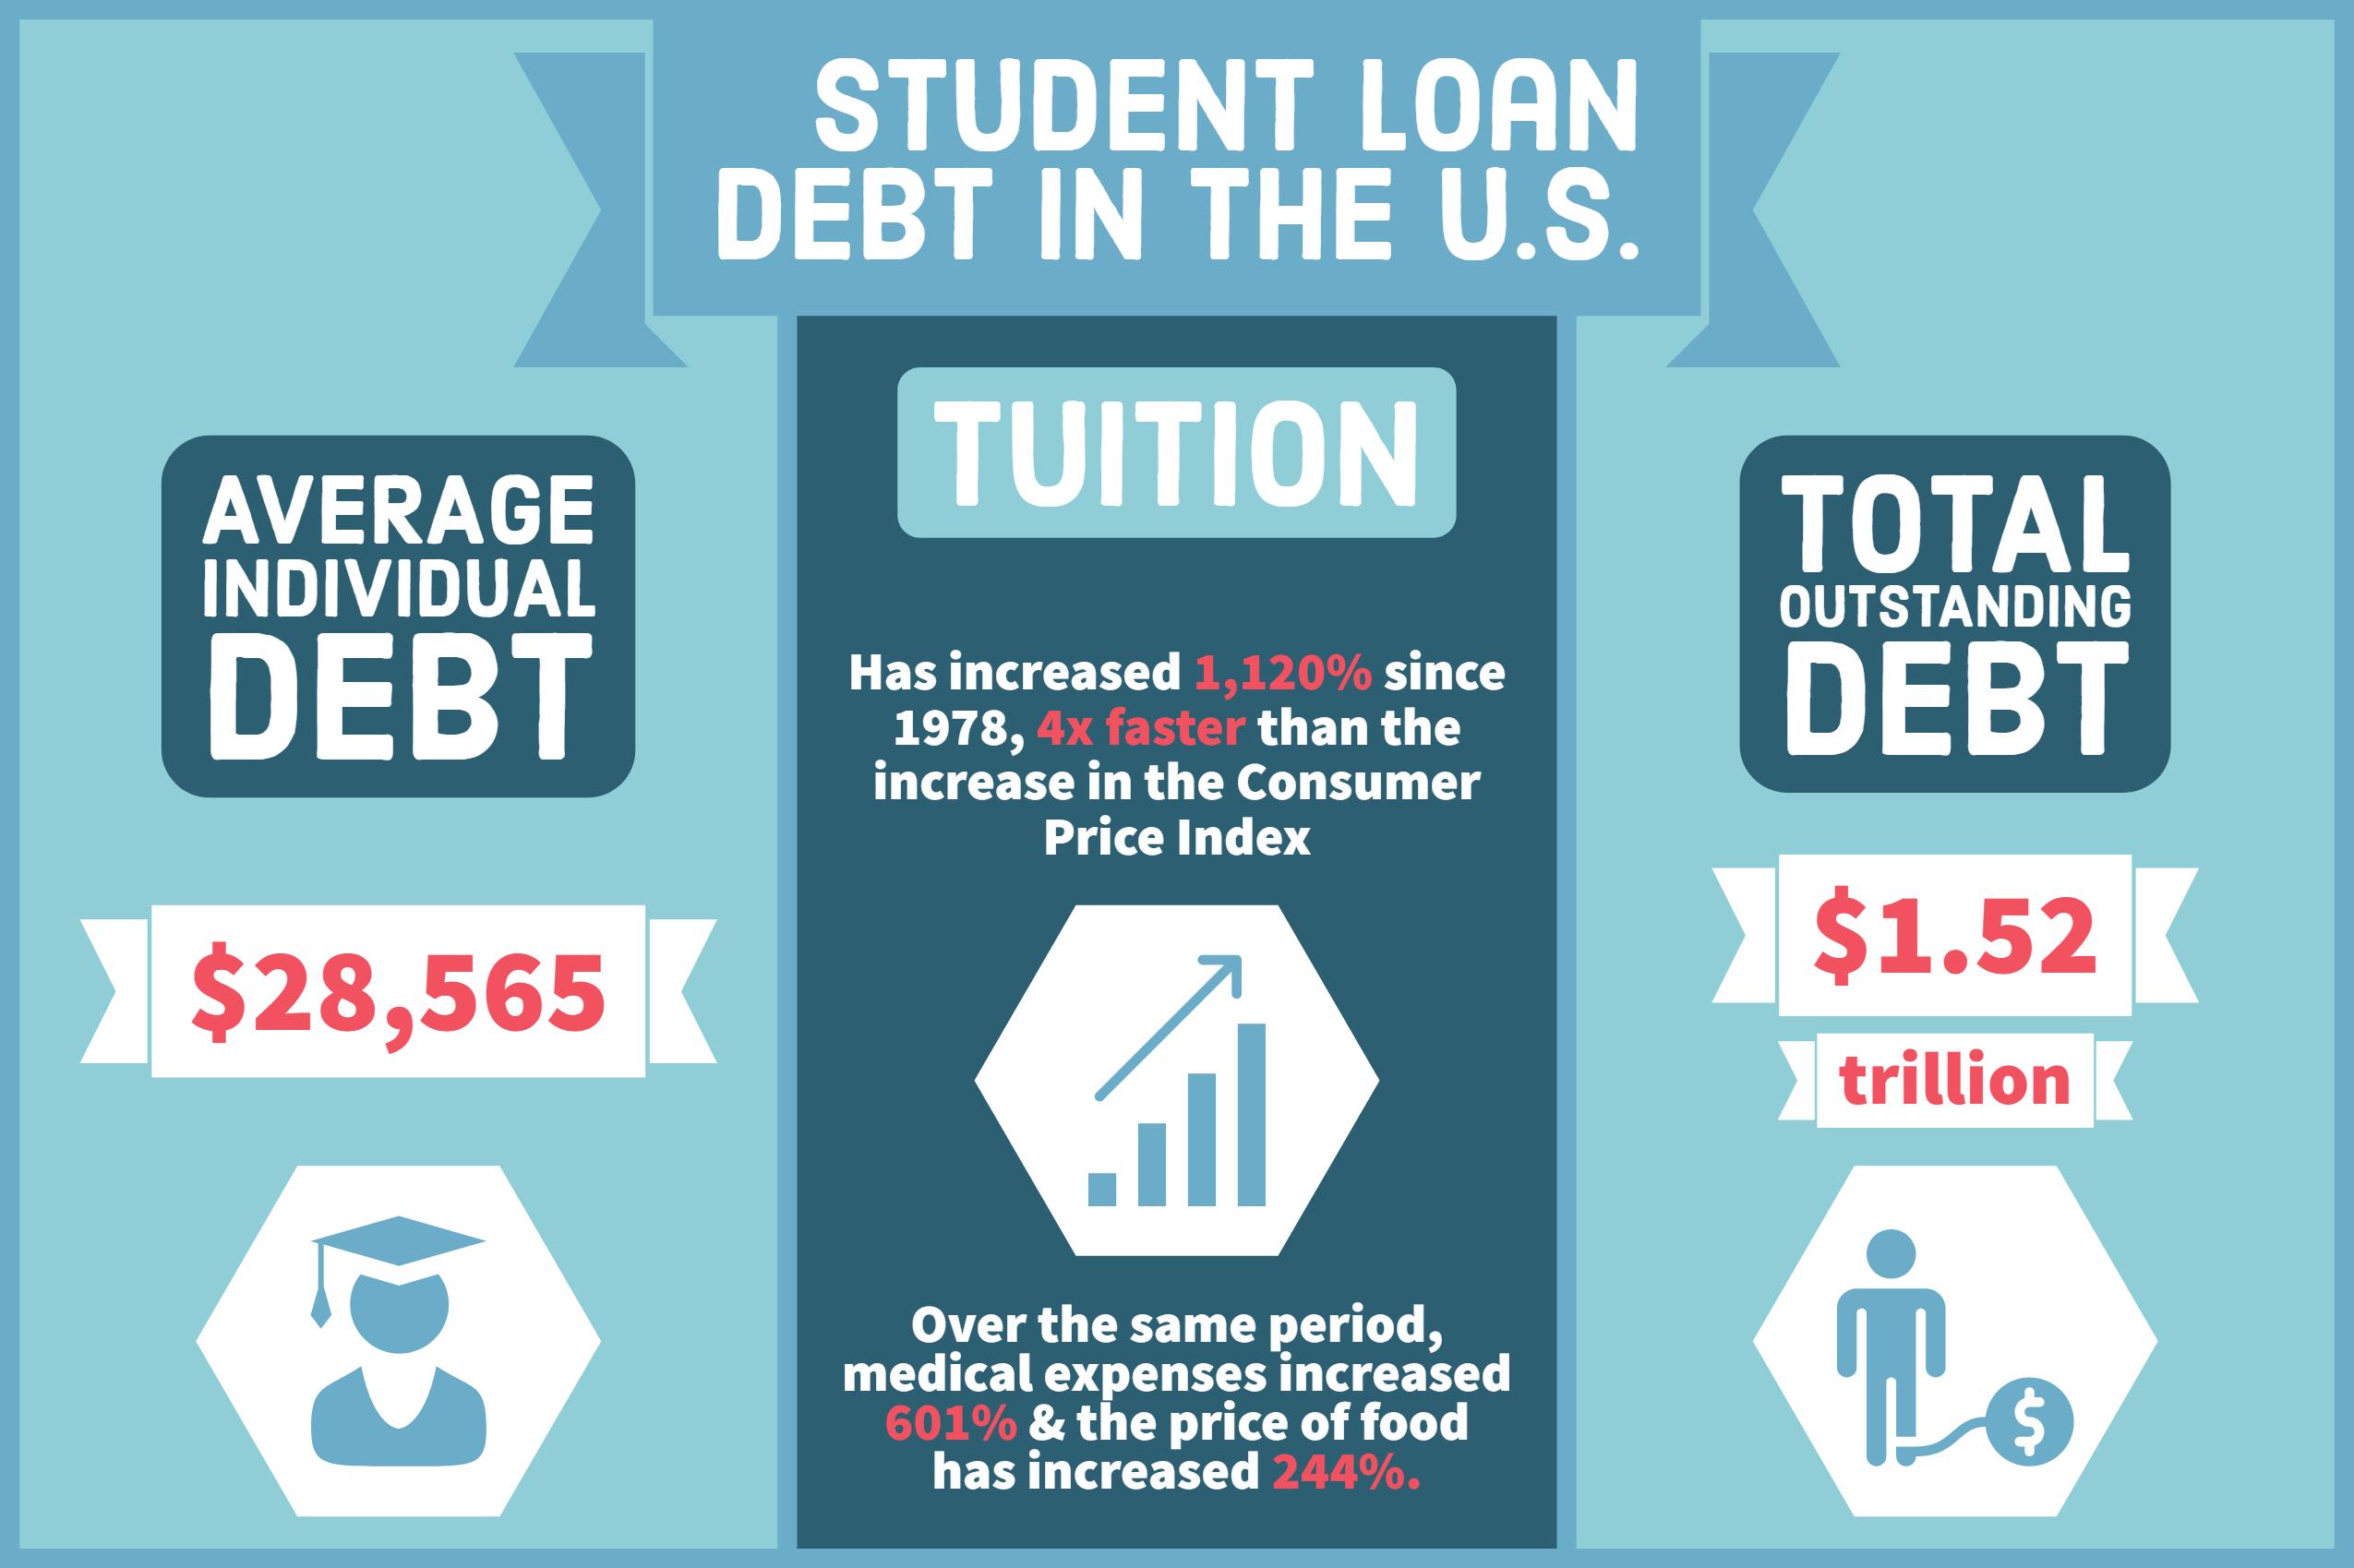 US Student Loan Debt 2020